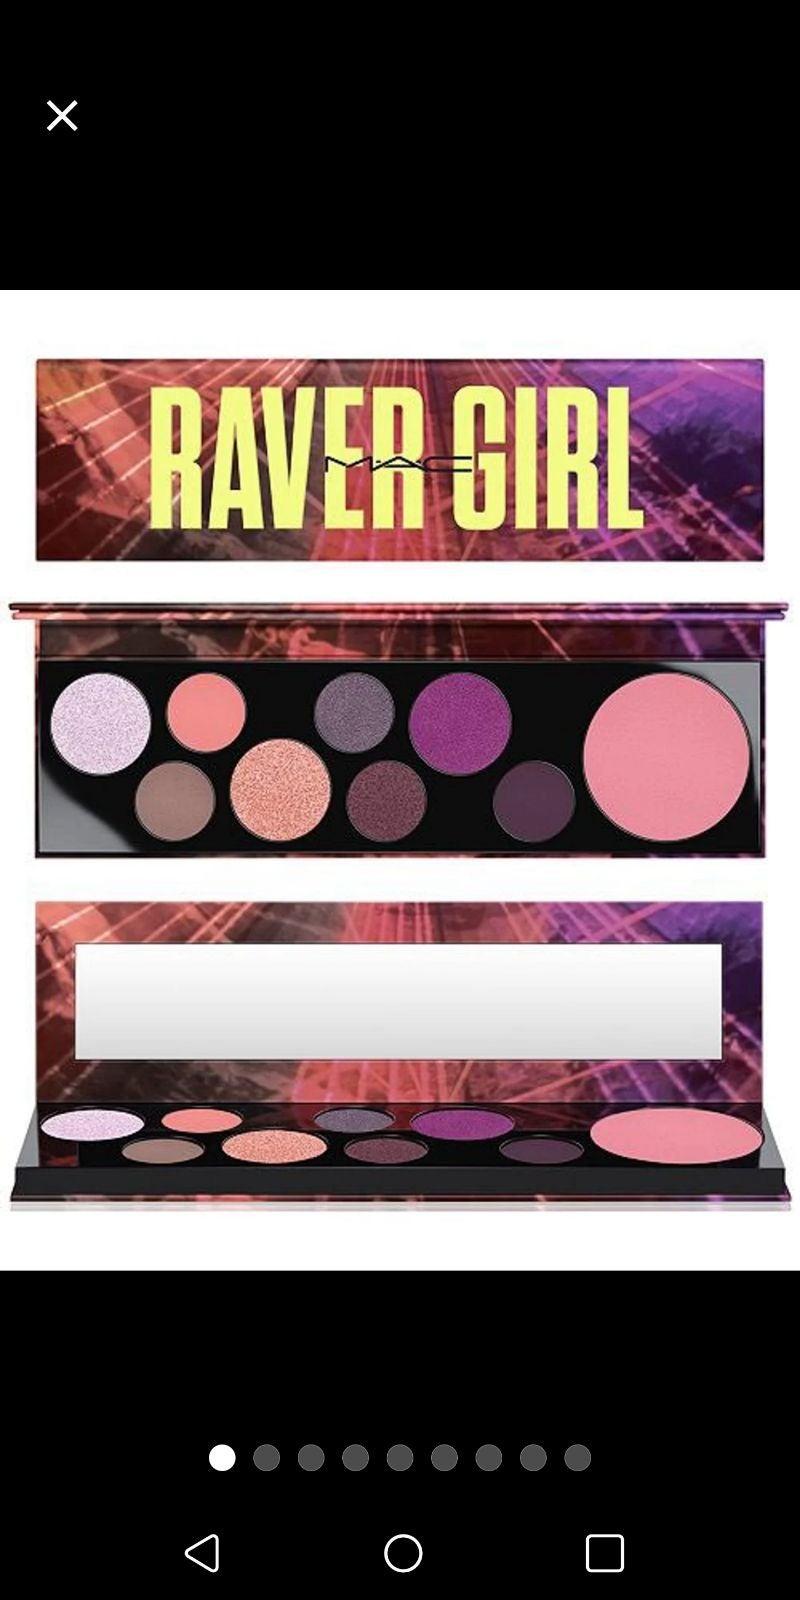 New Mac raver girl eyeshadow palette